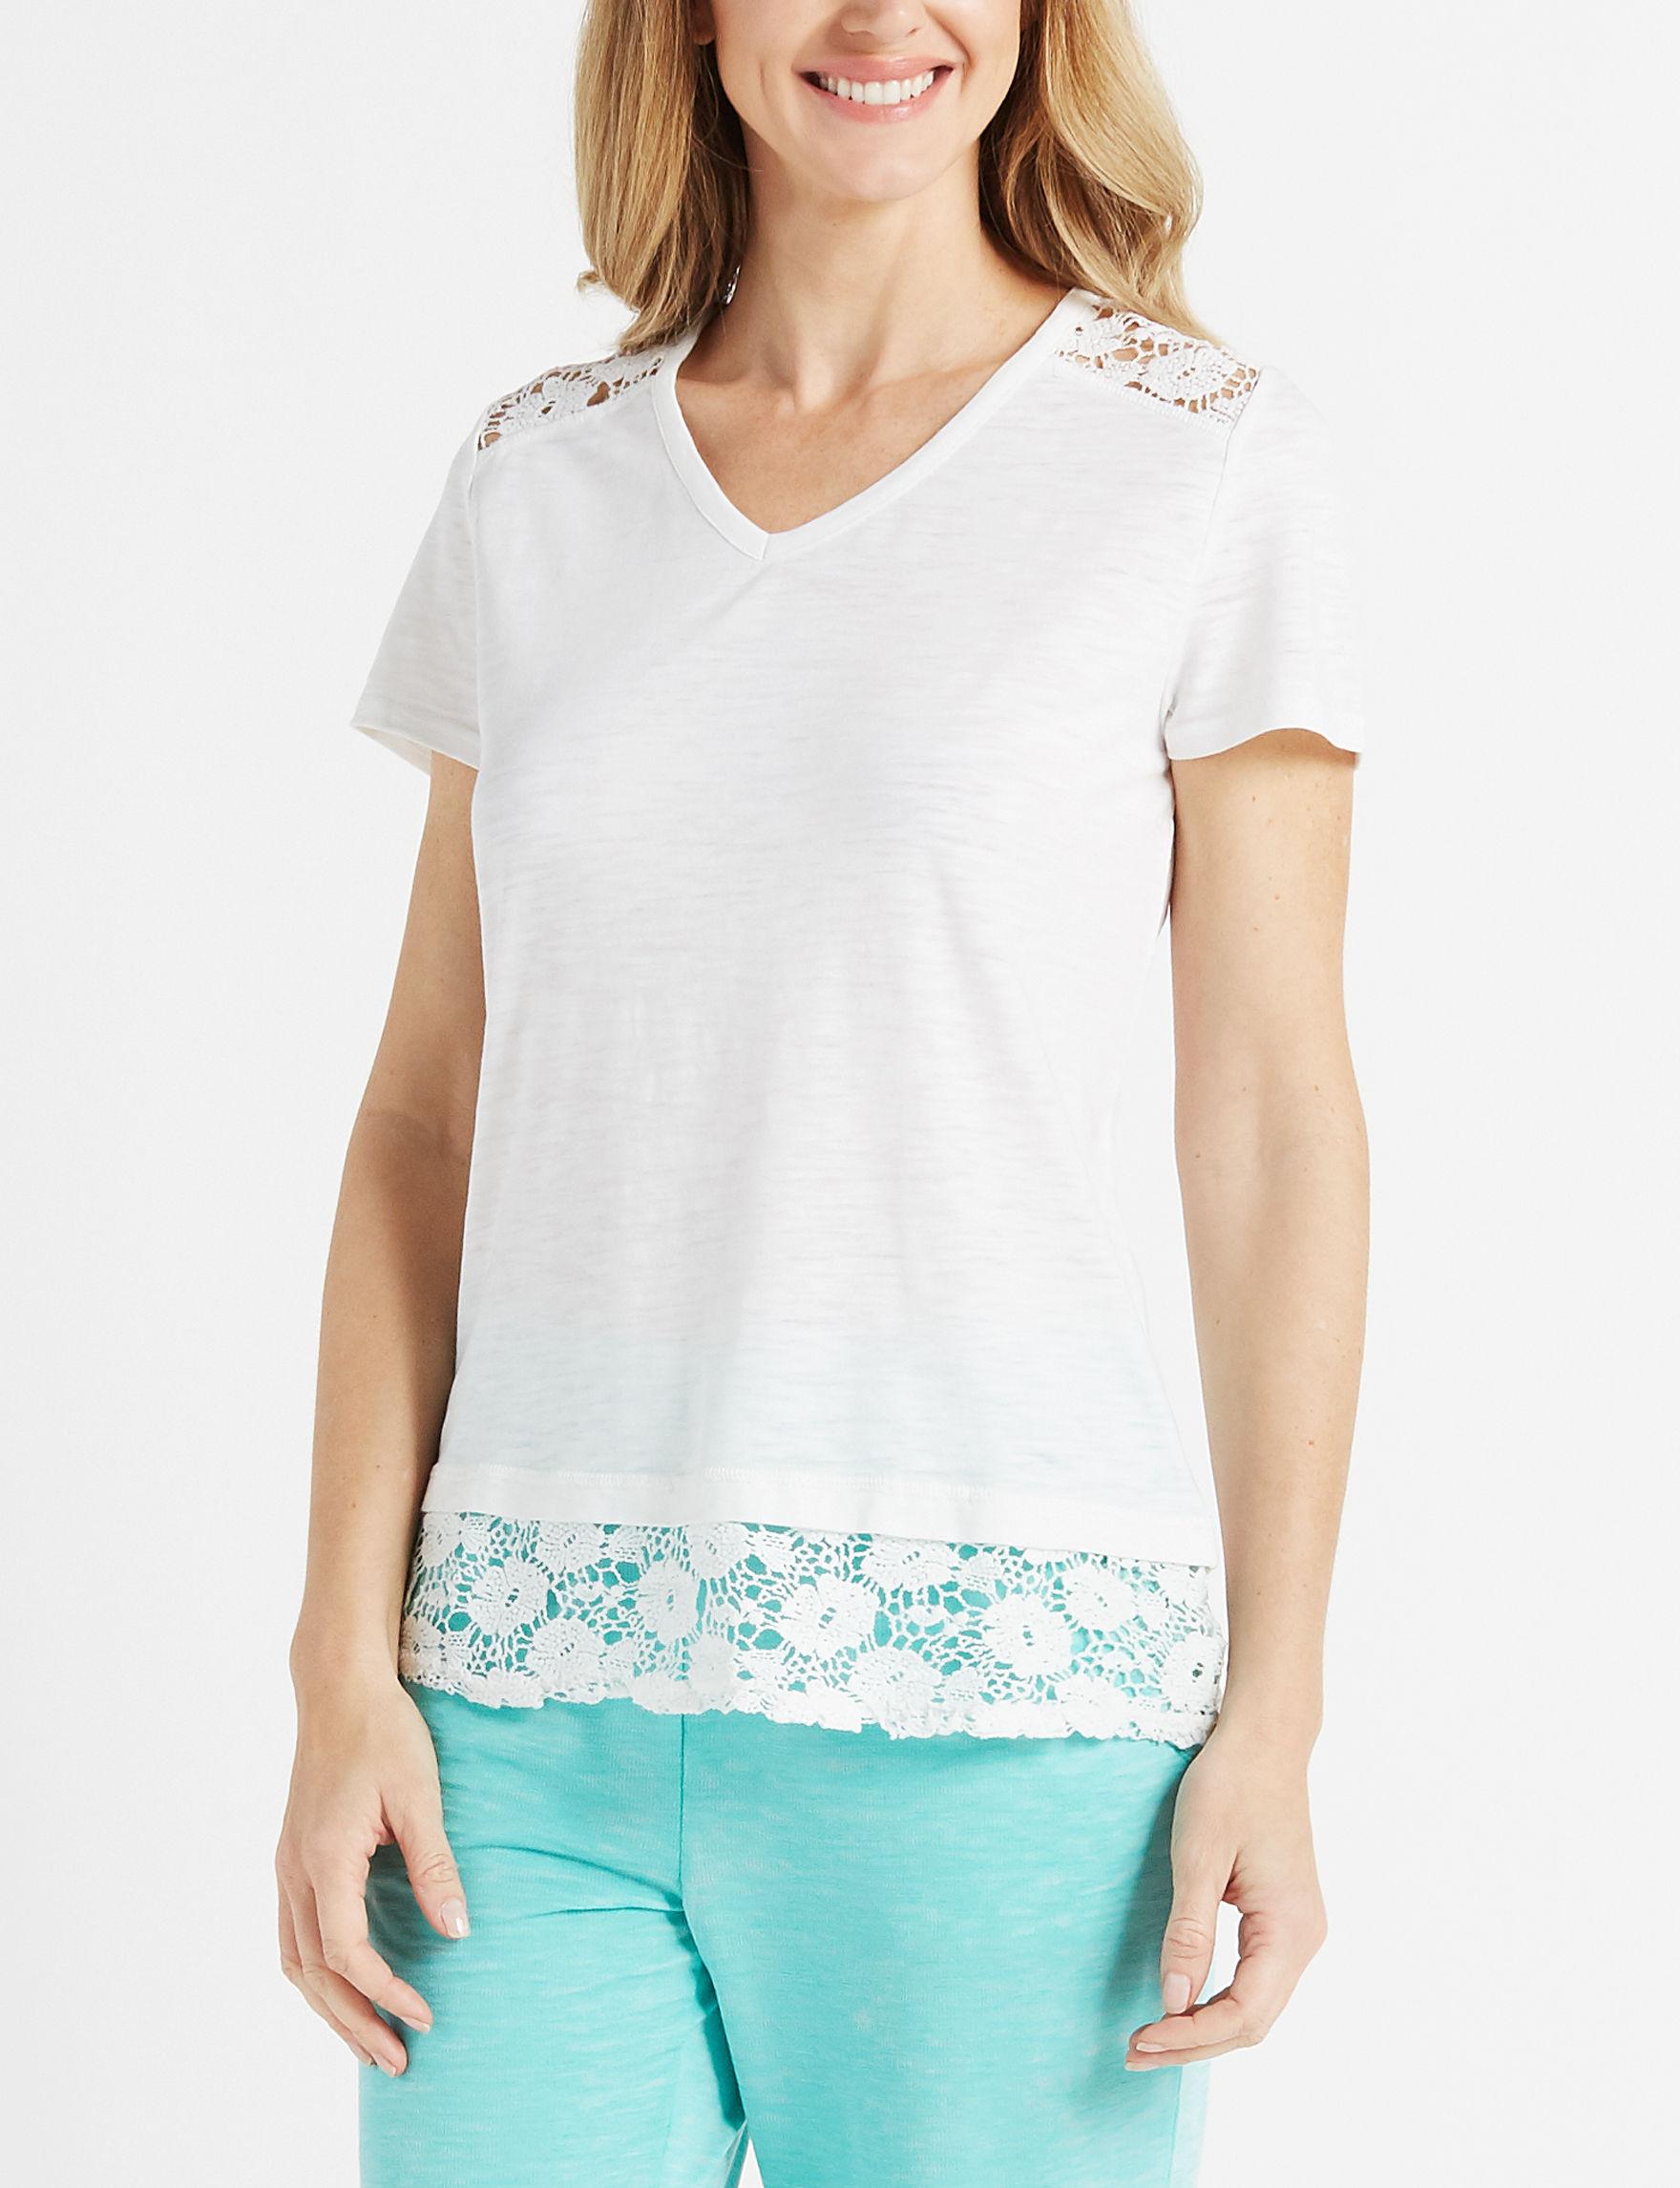 Onyx White Shirts & Blouses Tees & Tanks